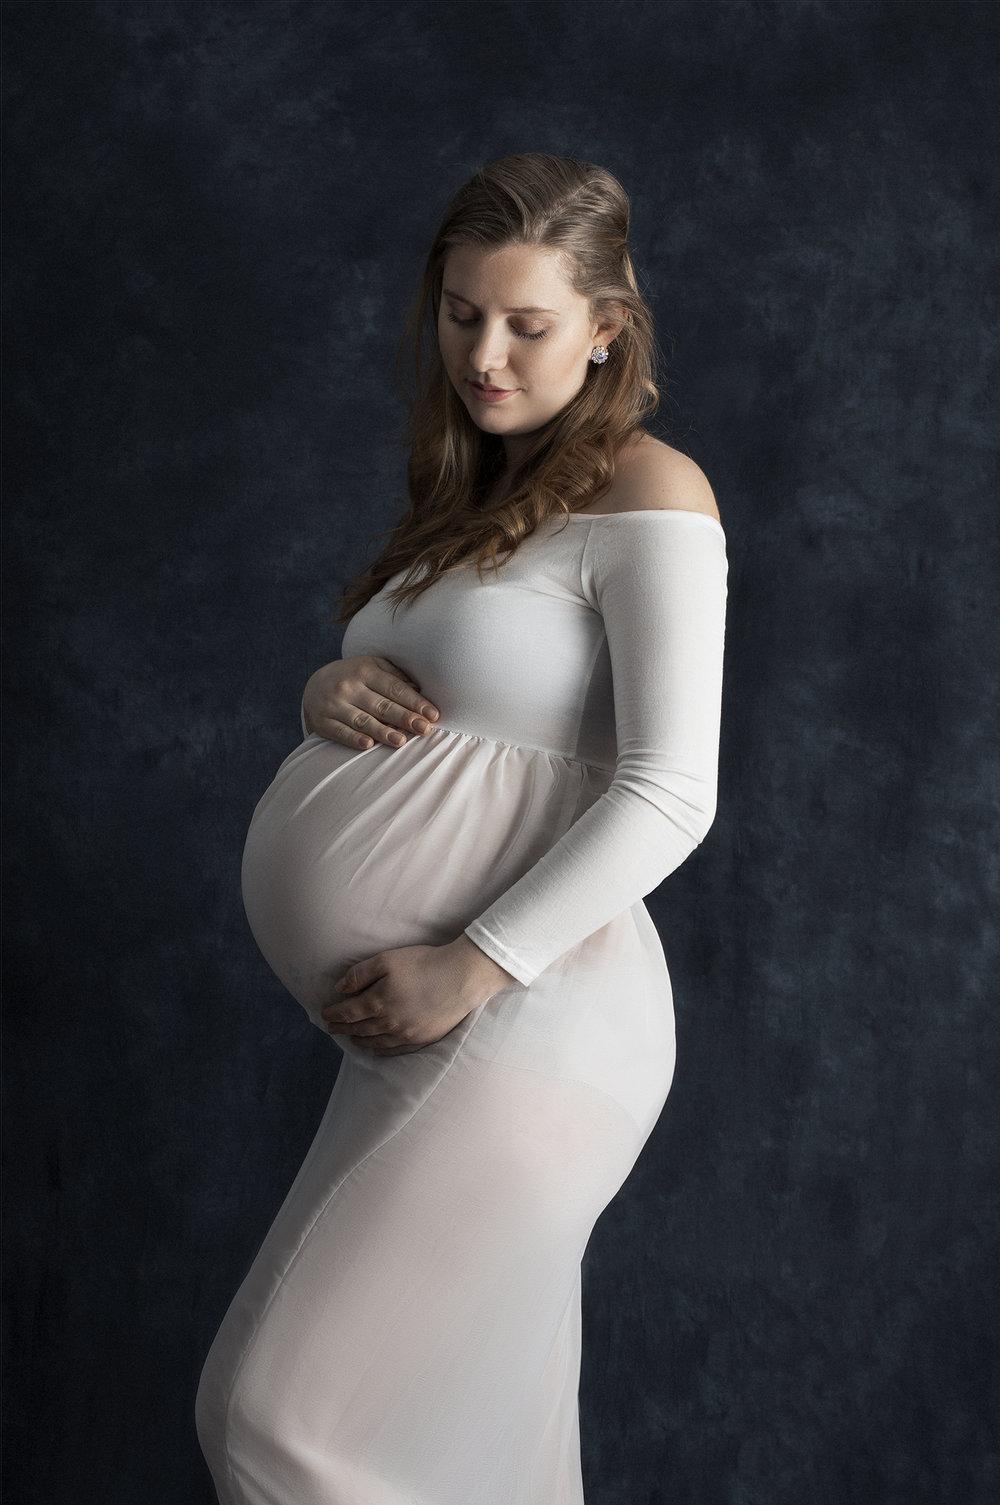 Gravidfotografering-Emilie-Fotograf-Tina-Bergersen